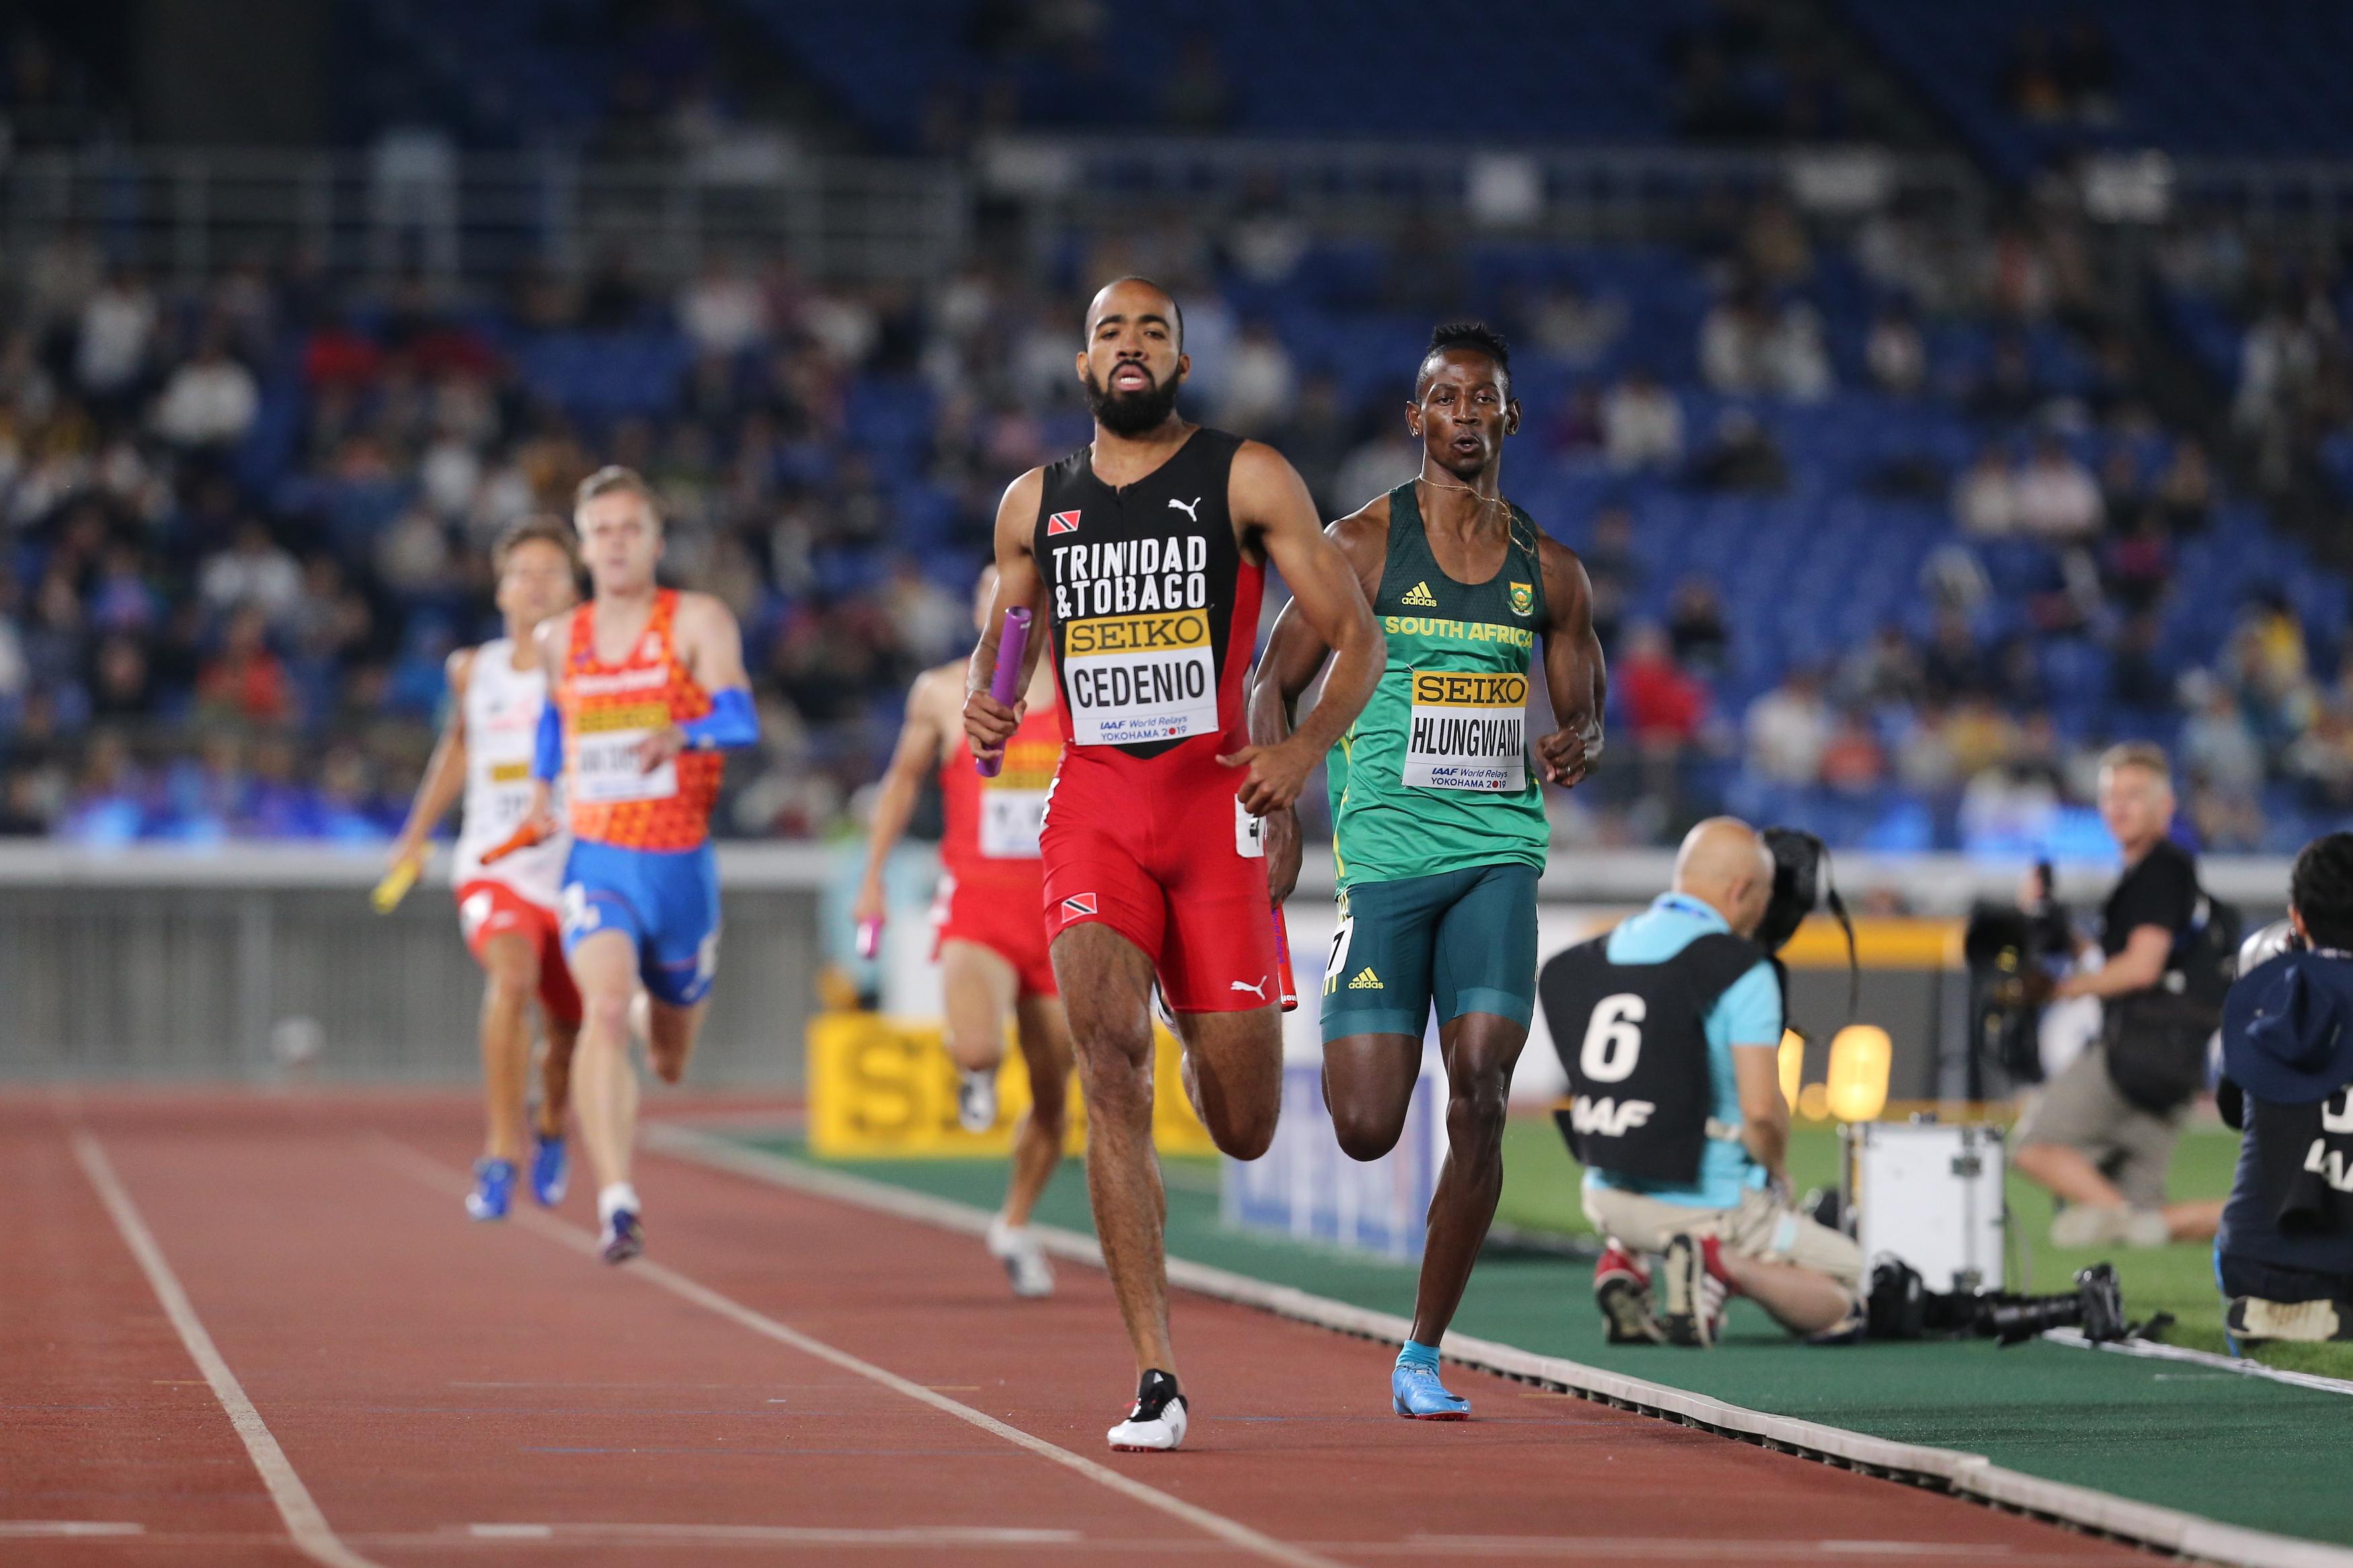 Machel CEDENIO TRI men 4x400 heats 2019-05-11 World Relays Yokohama 2019 by Roger Sedres